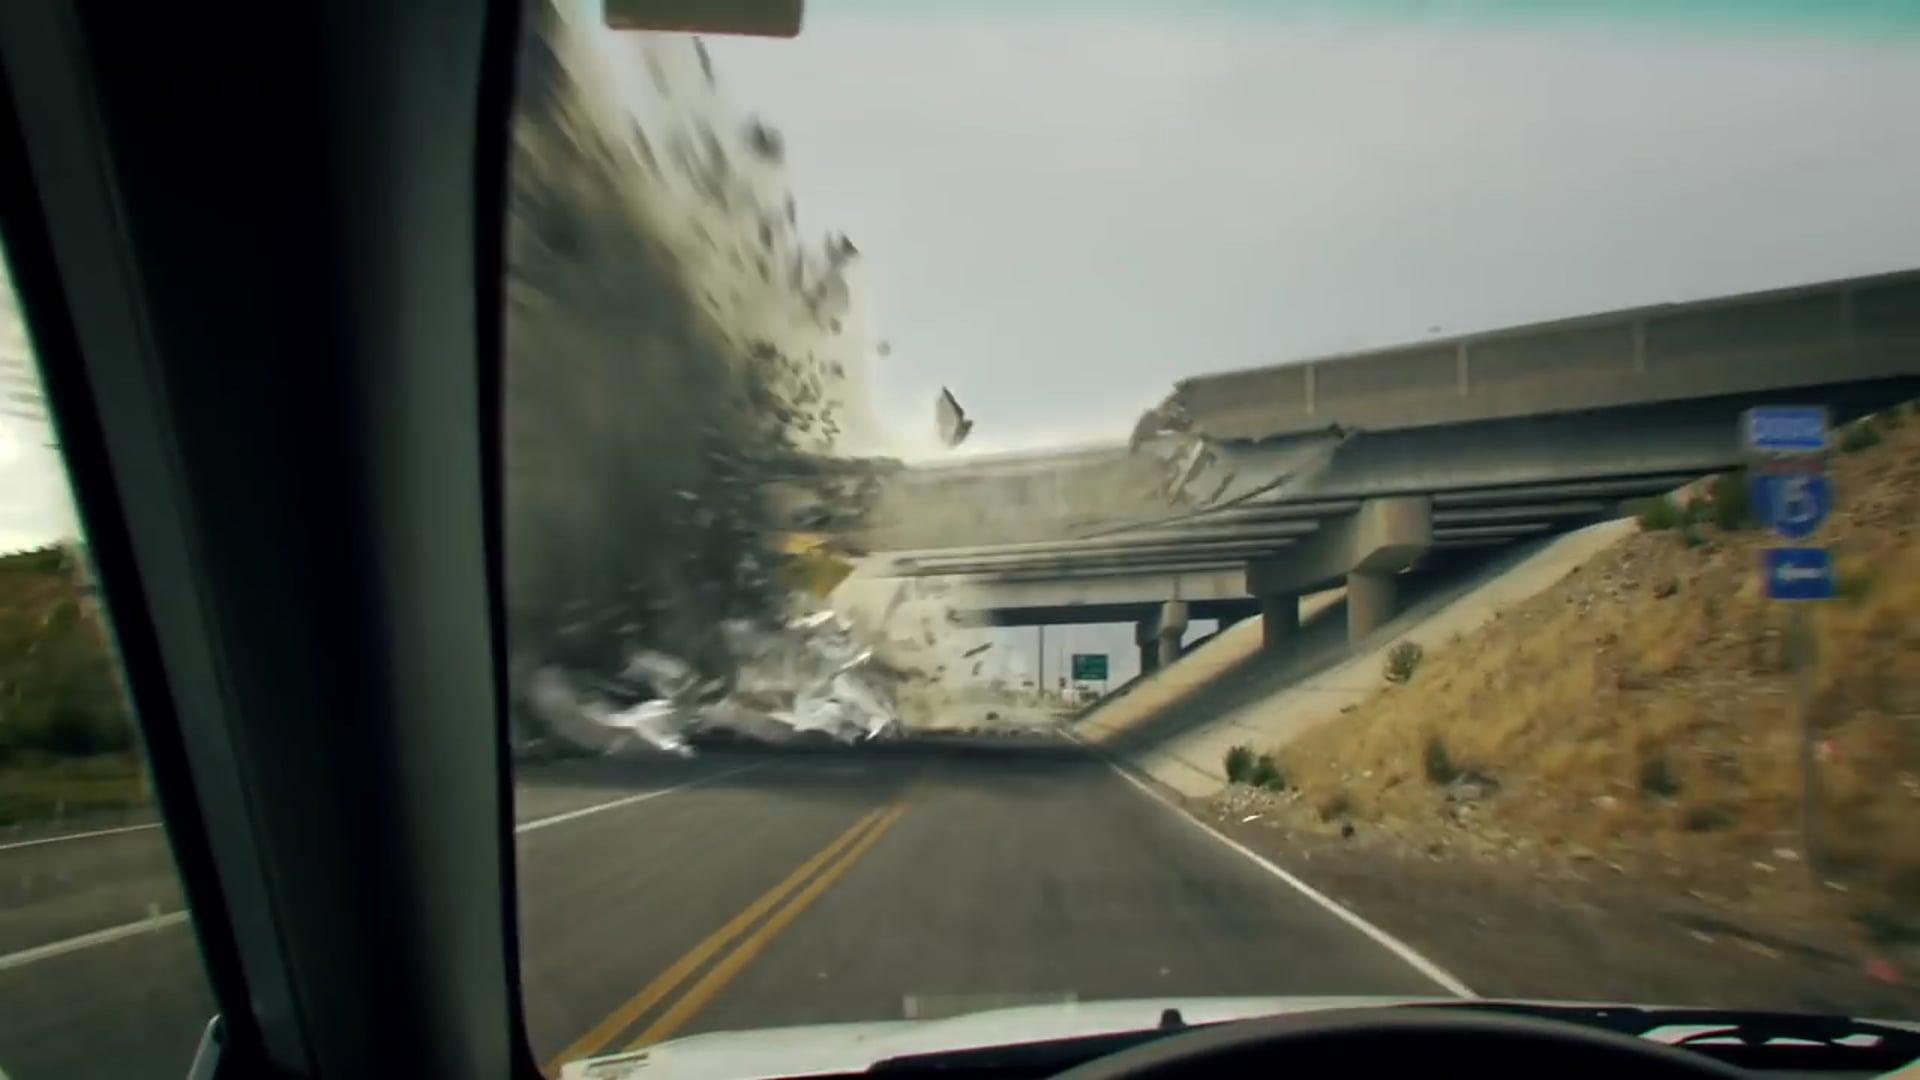 Bridge Explosion VFX - Syntheyes, Maya, Fusion